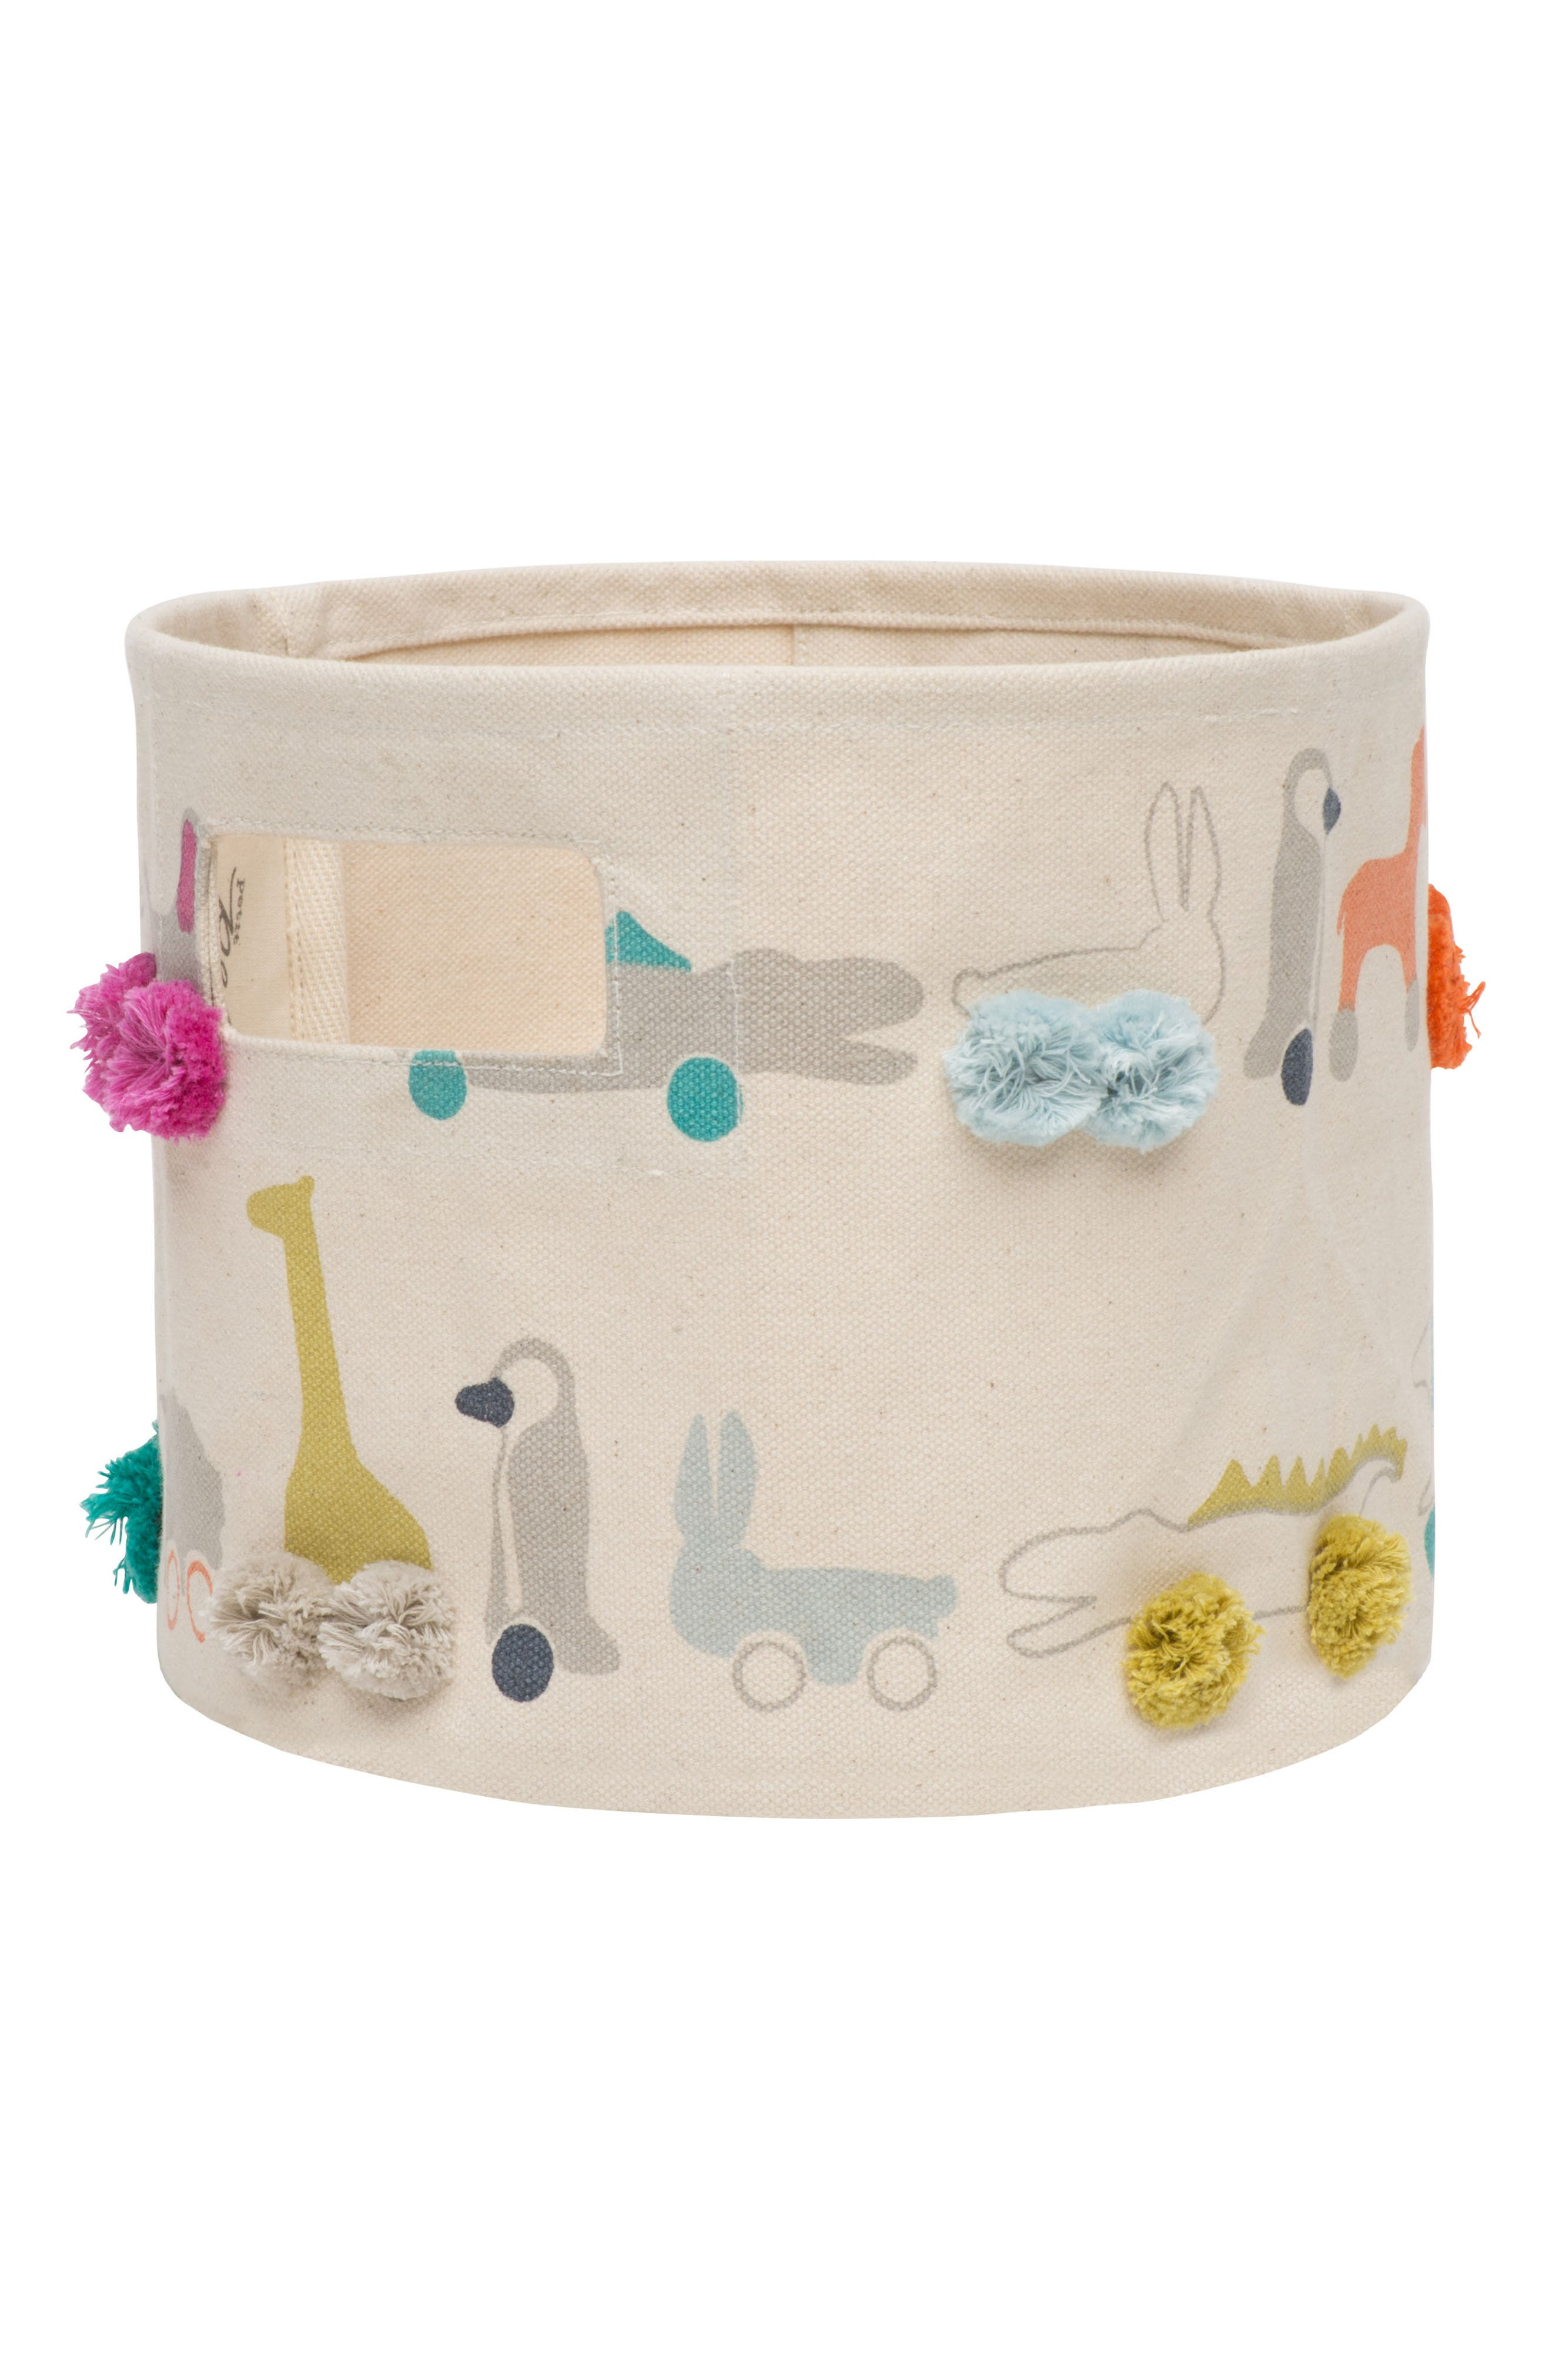 Mini Pull Toys Basket,                         Main,                         color, Multi